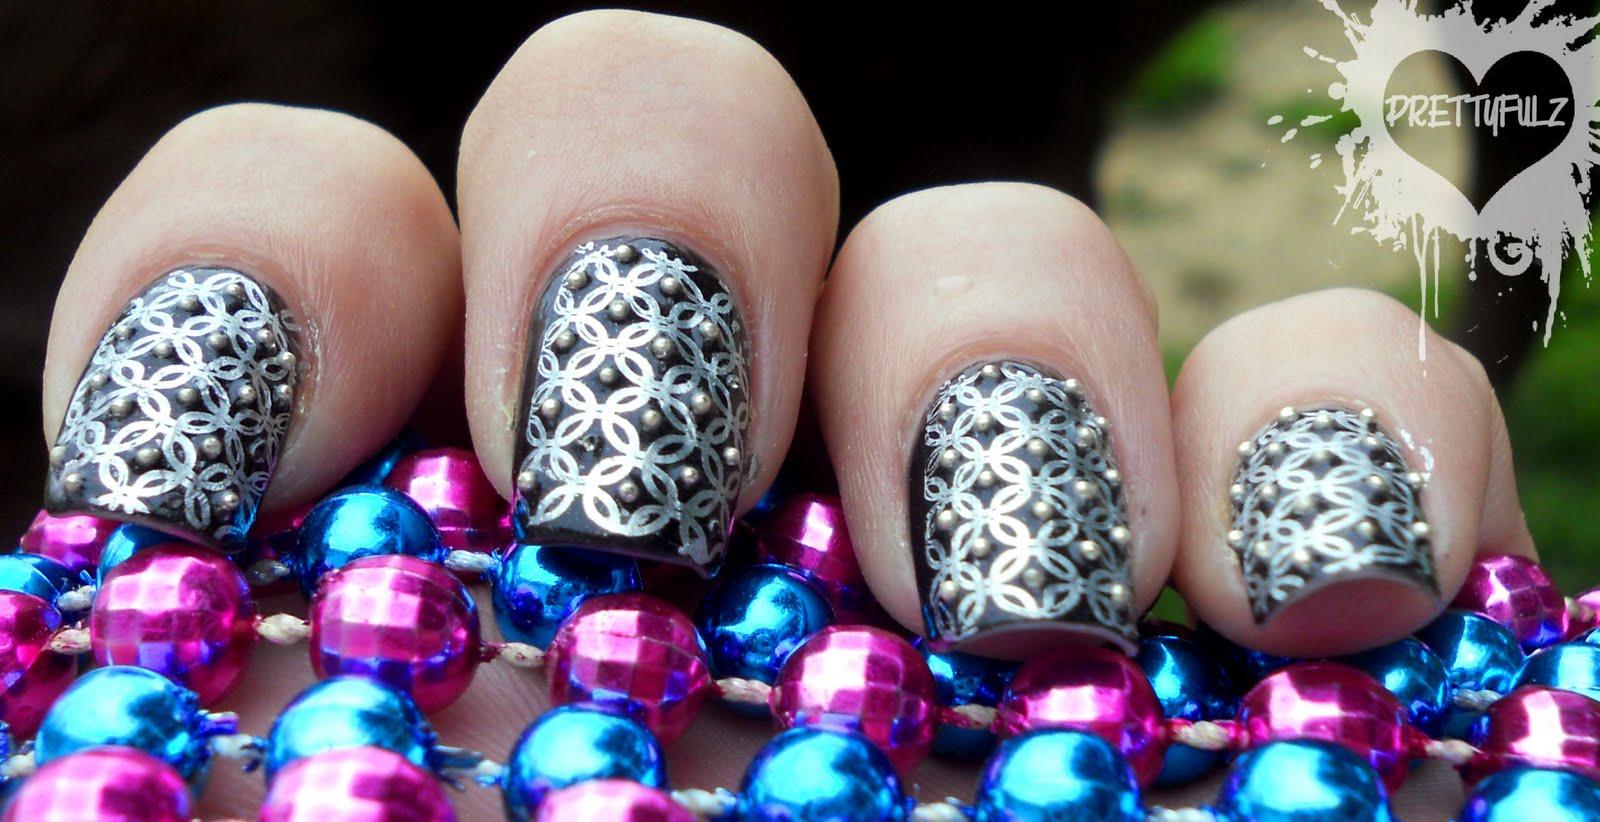 Prettyfulz: Black & Silver Deco Nail Art Design